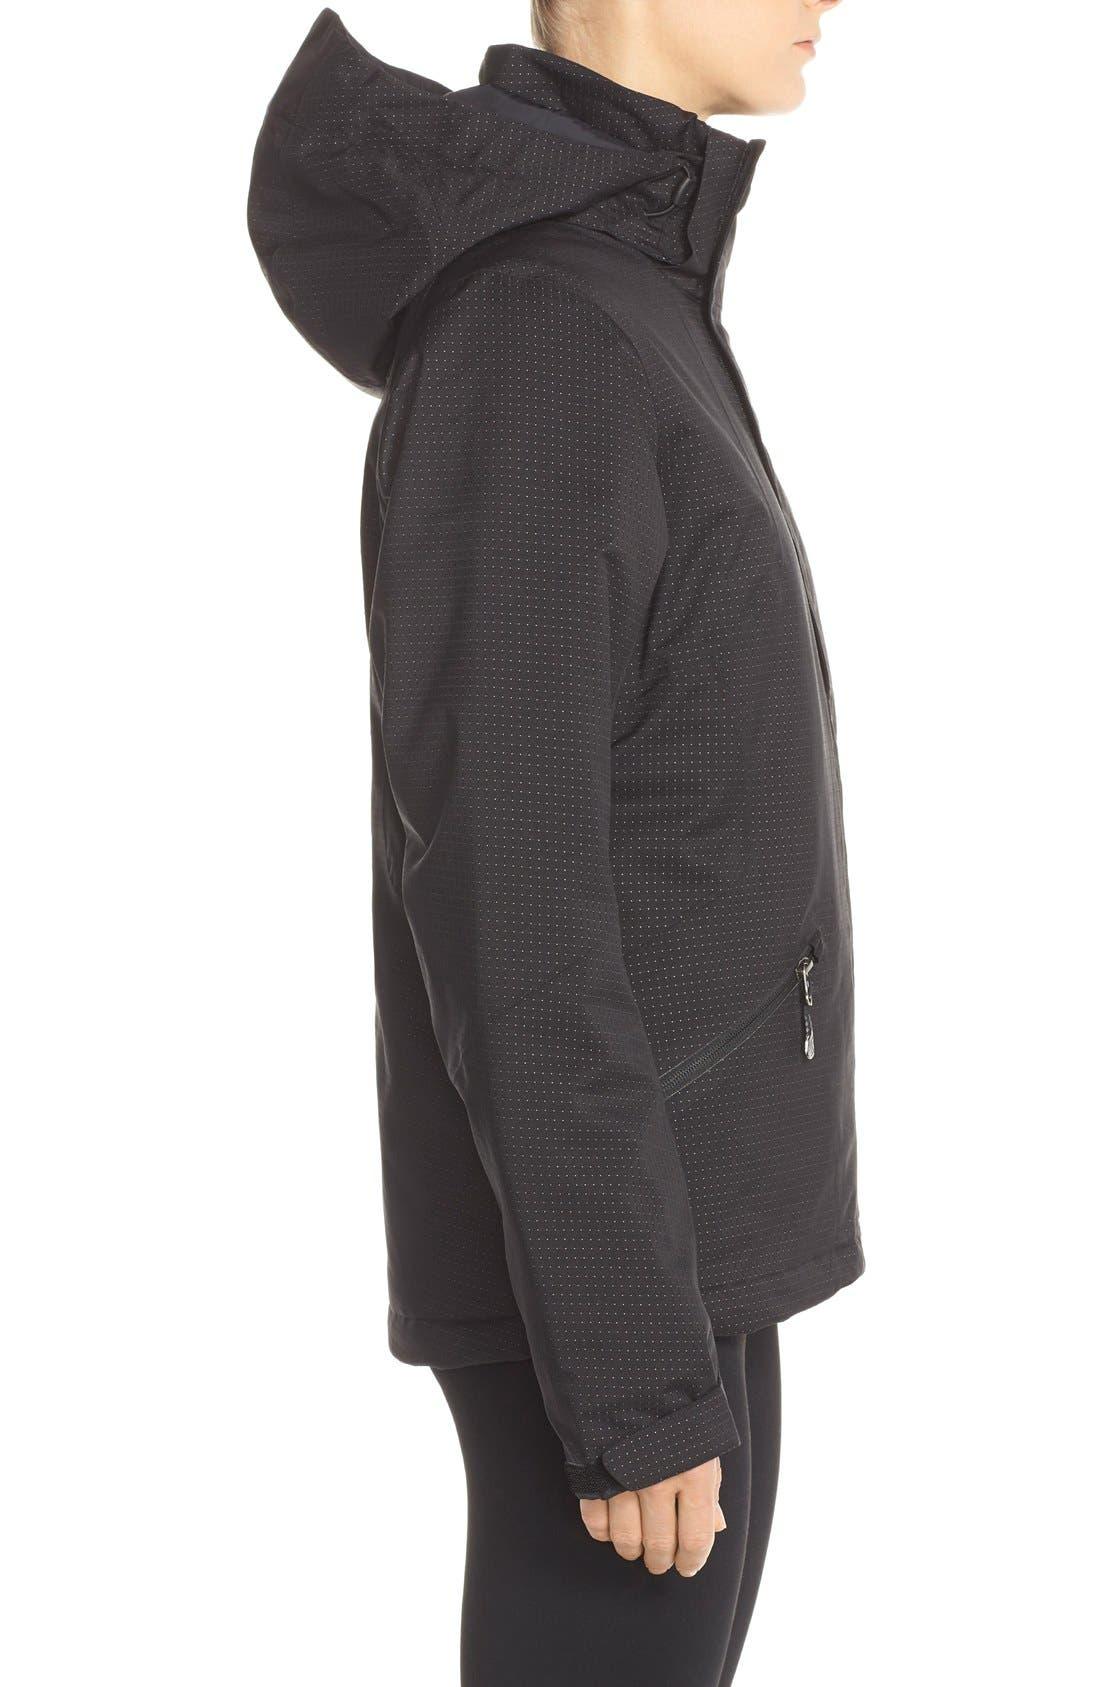 THE NORTH FACE,                             'Lulea' Waterpoof Heatseeker<sup>™</sup> Jacket,                             Alternate thumbnail 5, color,                             001